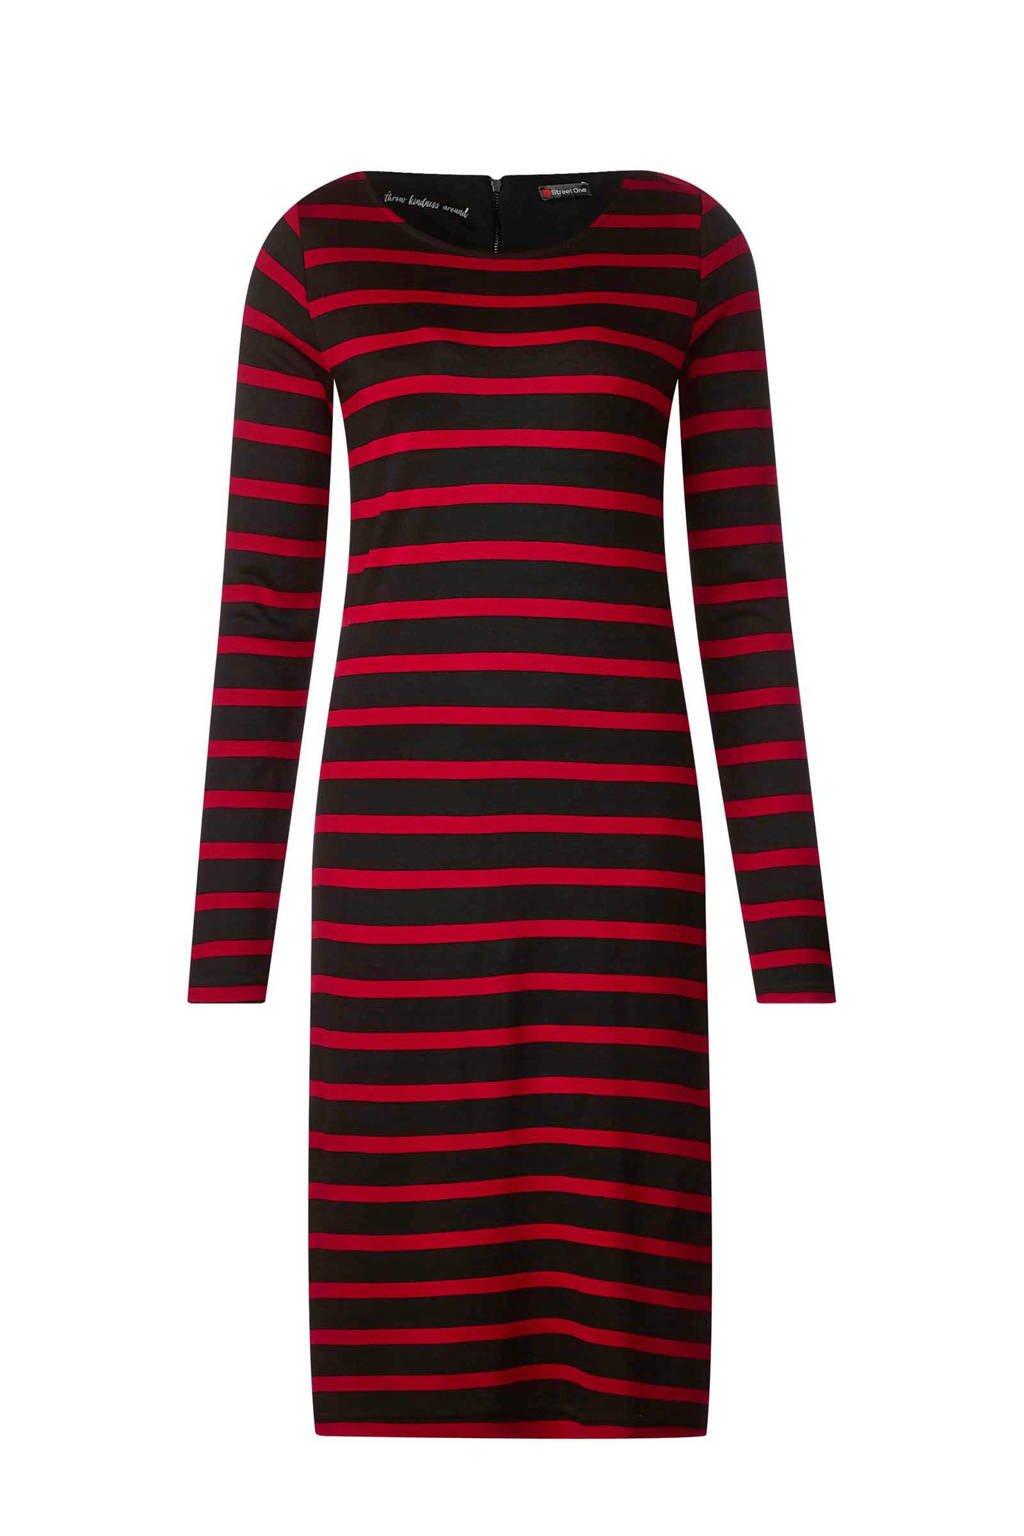 Street One jurk met strepen, Rood/zwart